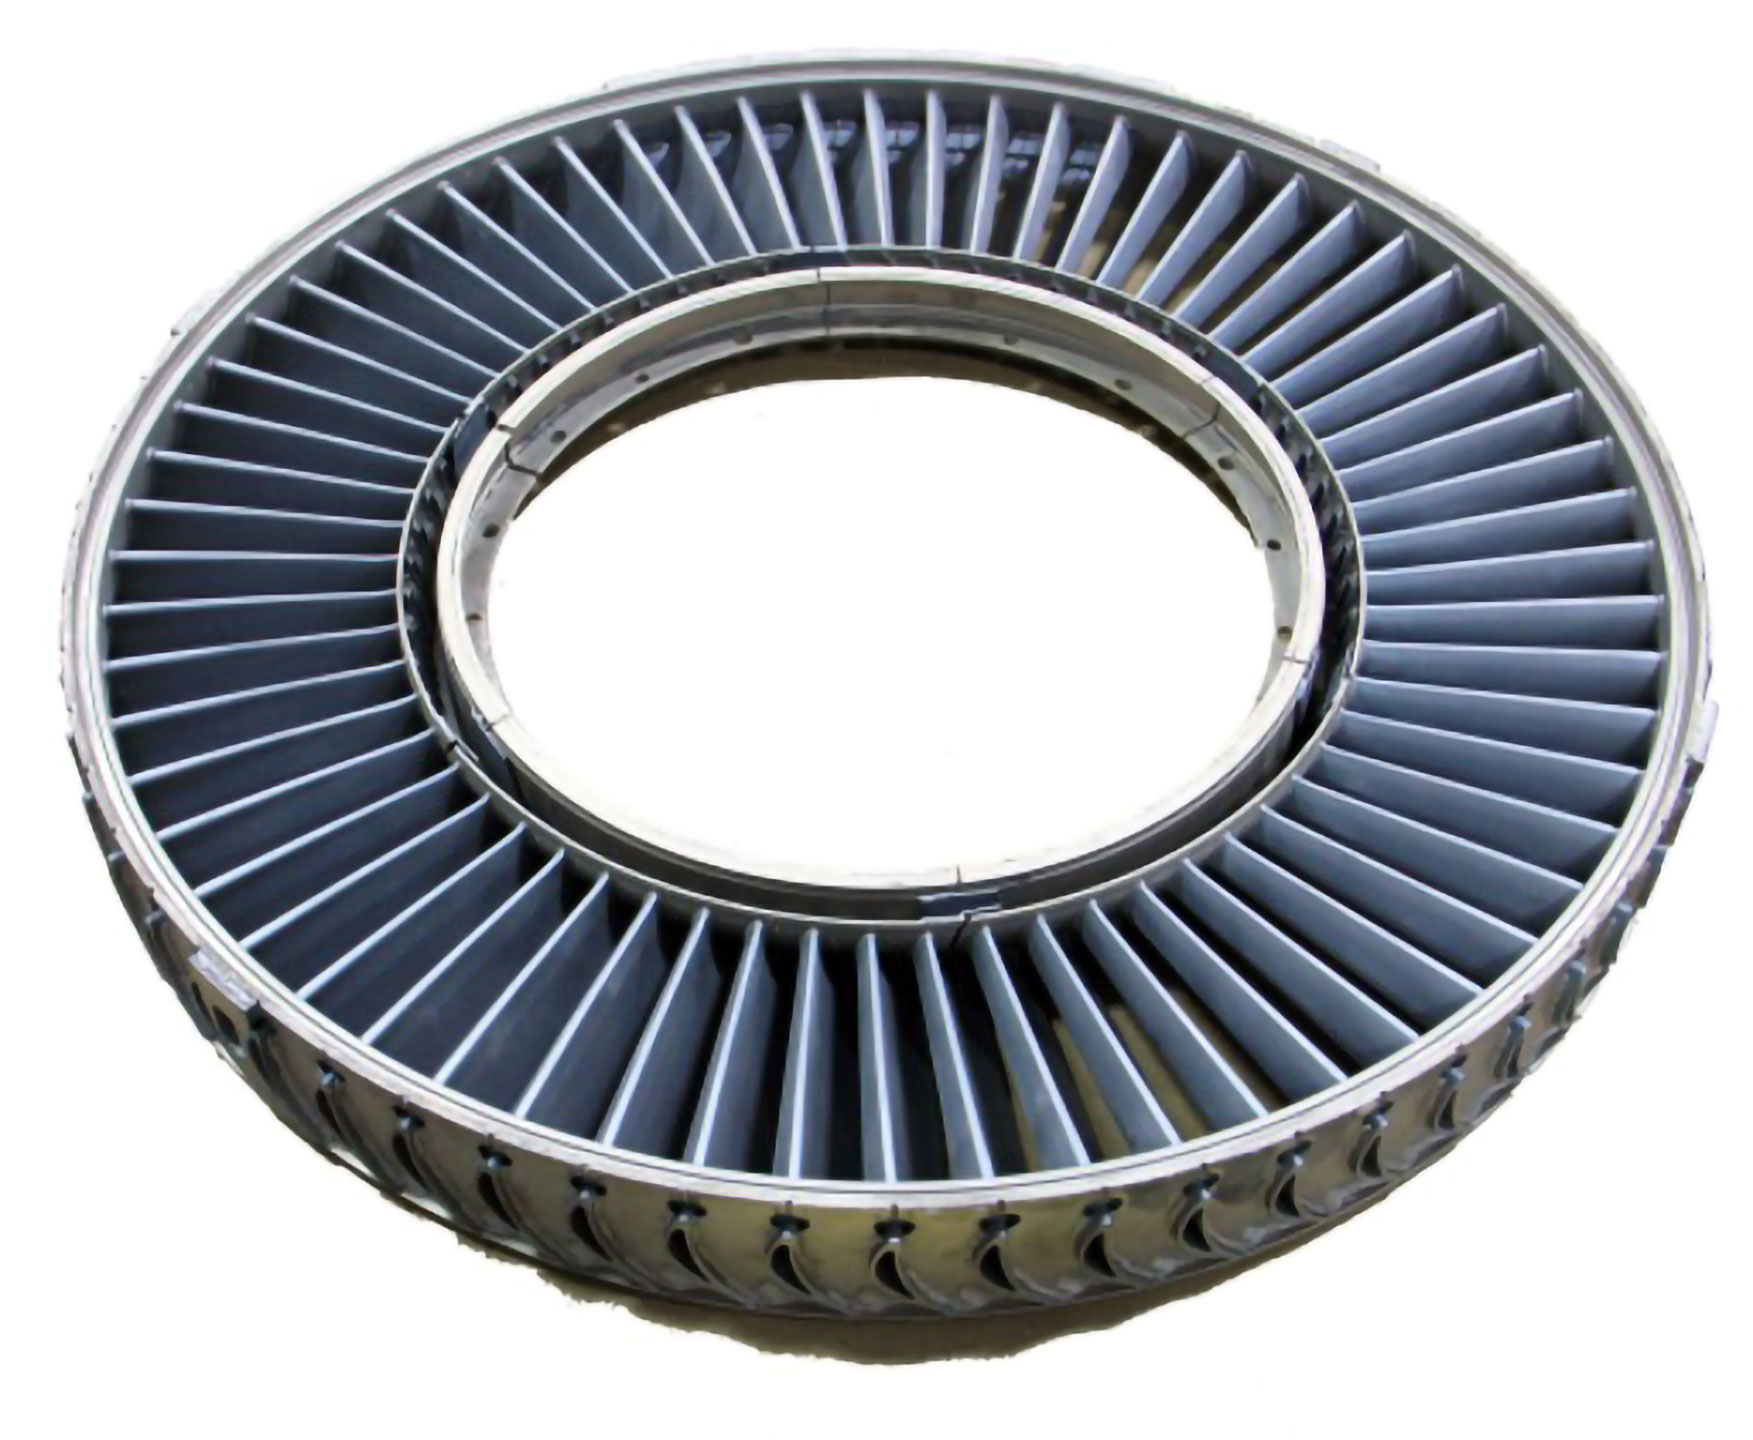 Turbine-Nozzles–Weld-Assembly-Braze-Heat-Treat-Machined